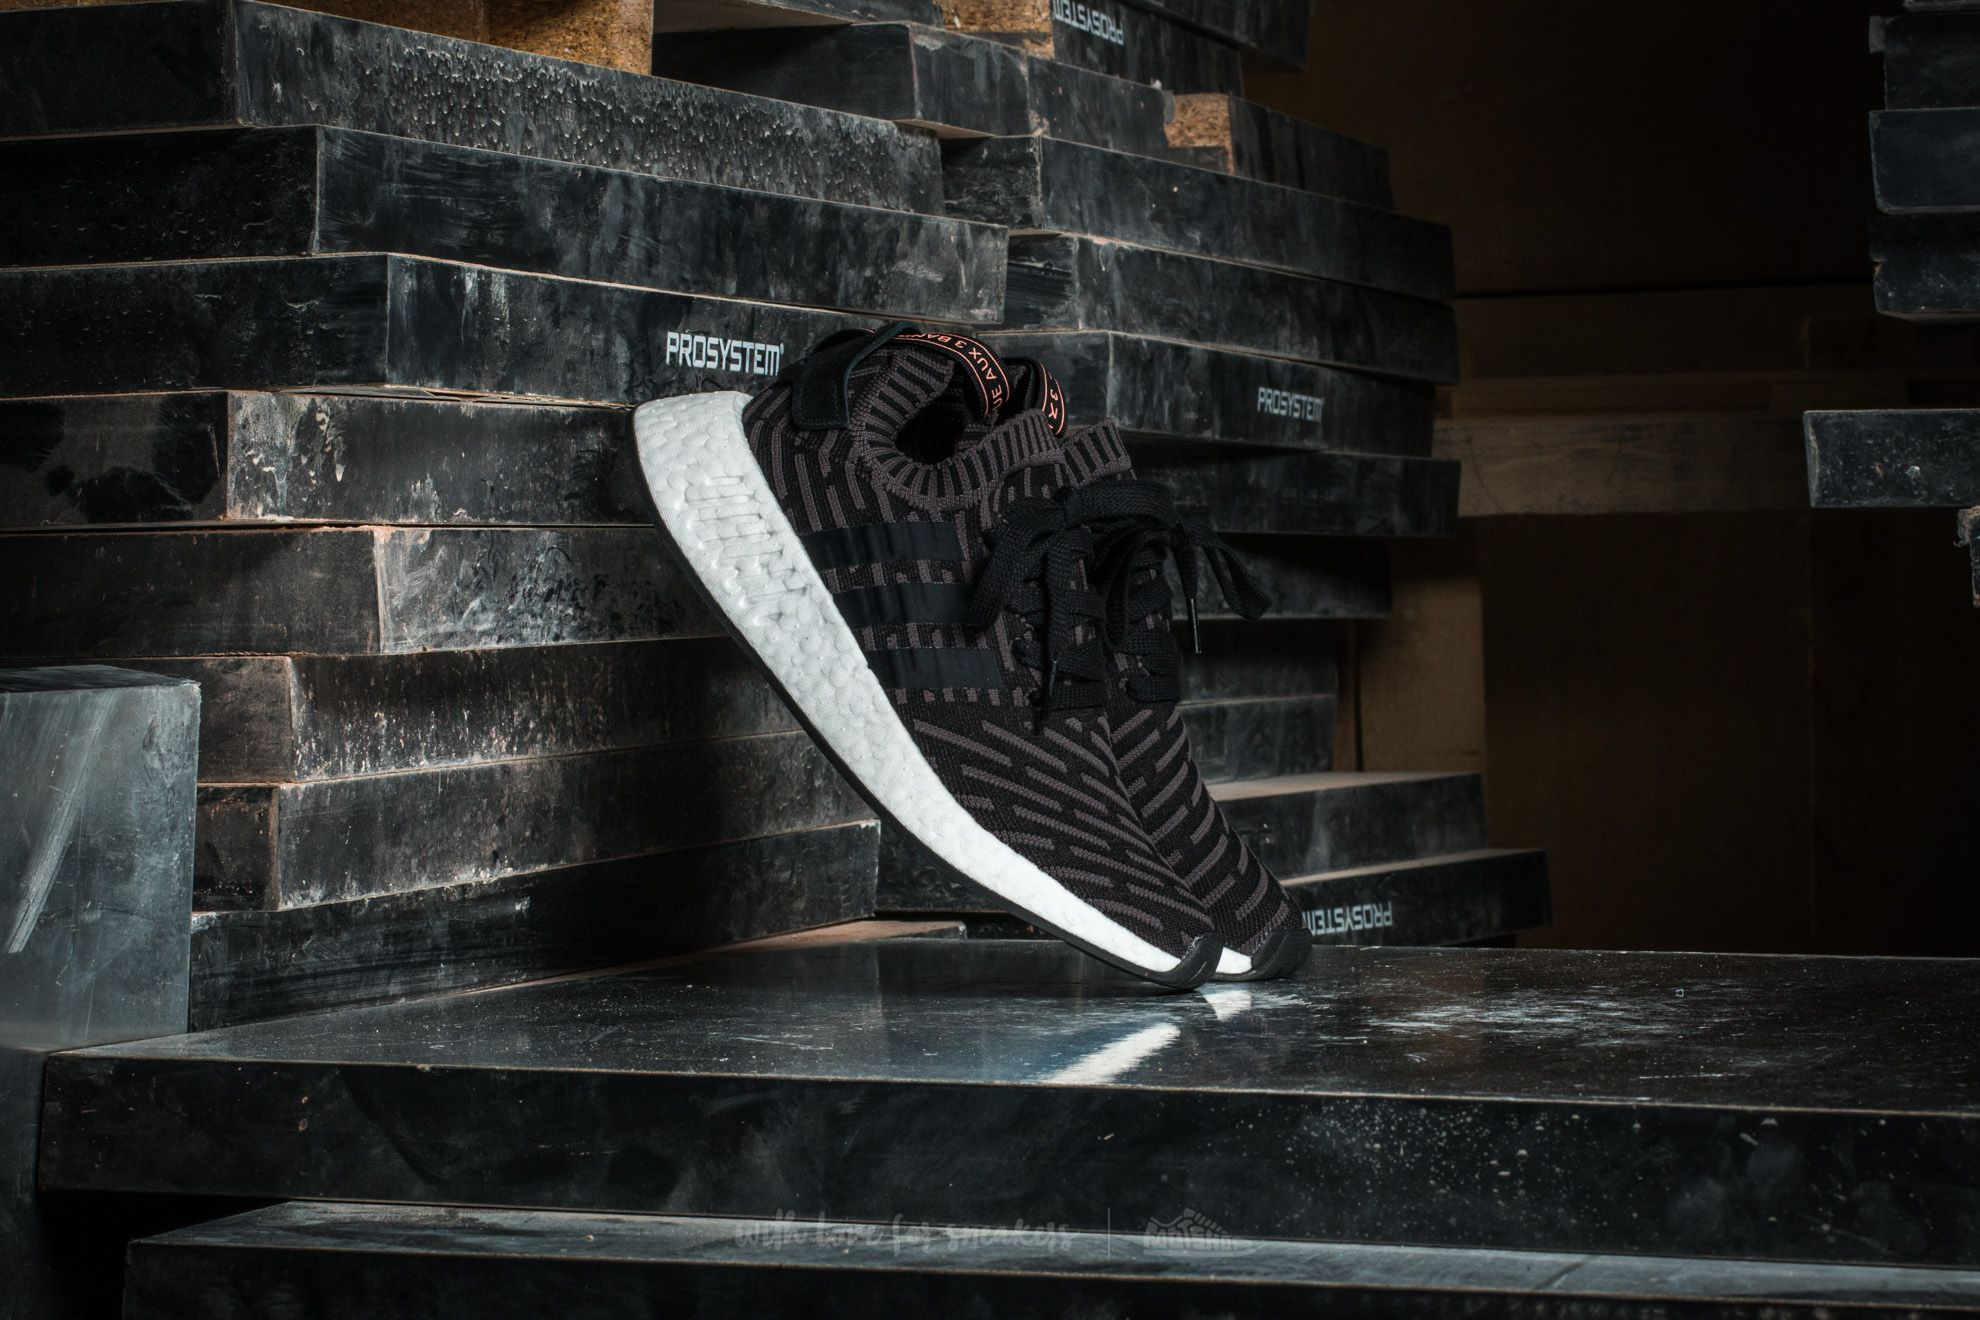 fa7f7a9e4eac3 adidas NMD R2 Primeknit W Utility Black  Core Black  Ftw White ...